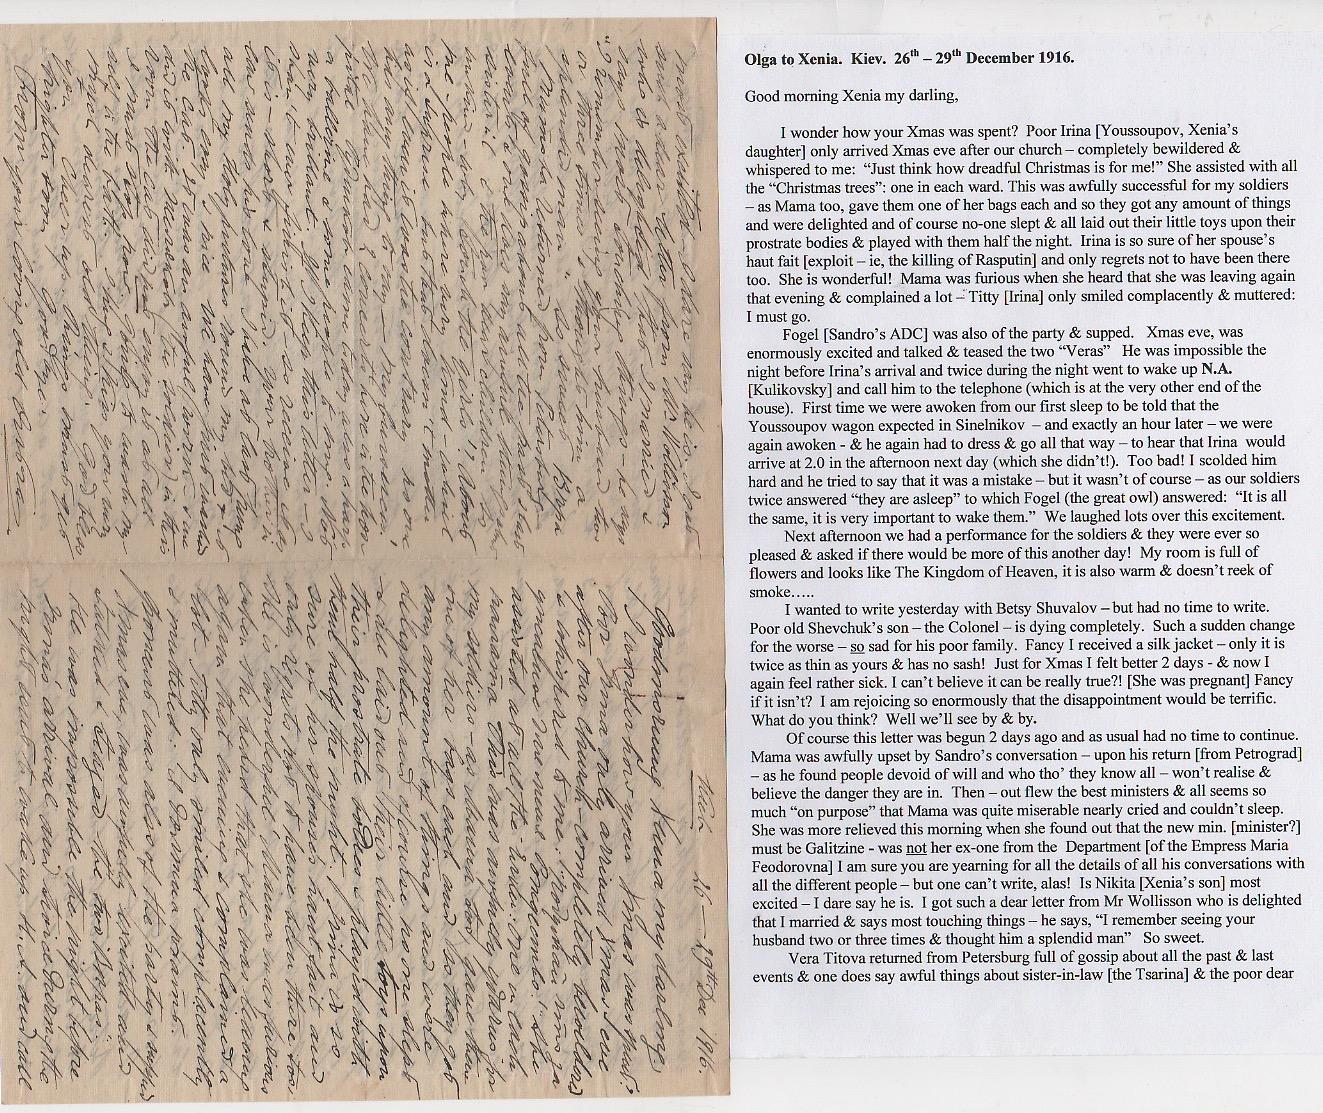 Royalty Grand Duchess Olga Correspondence To Her Sister Grand Duchess Xenia 1916-1920 - Image 16 of 47